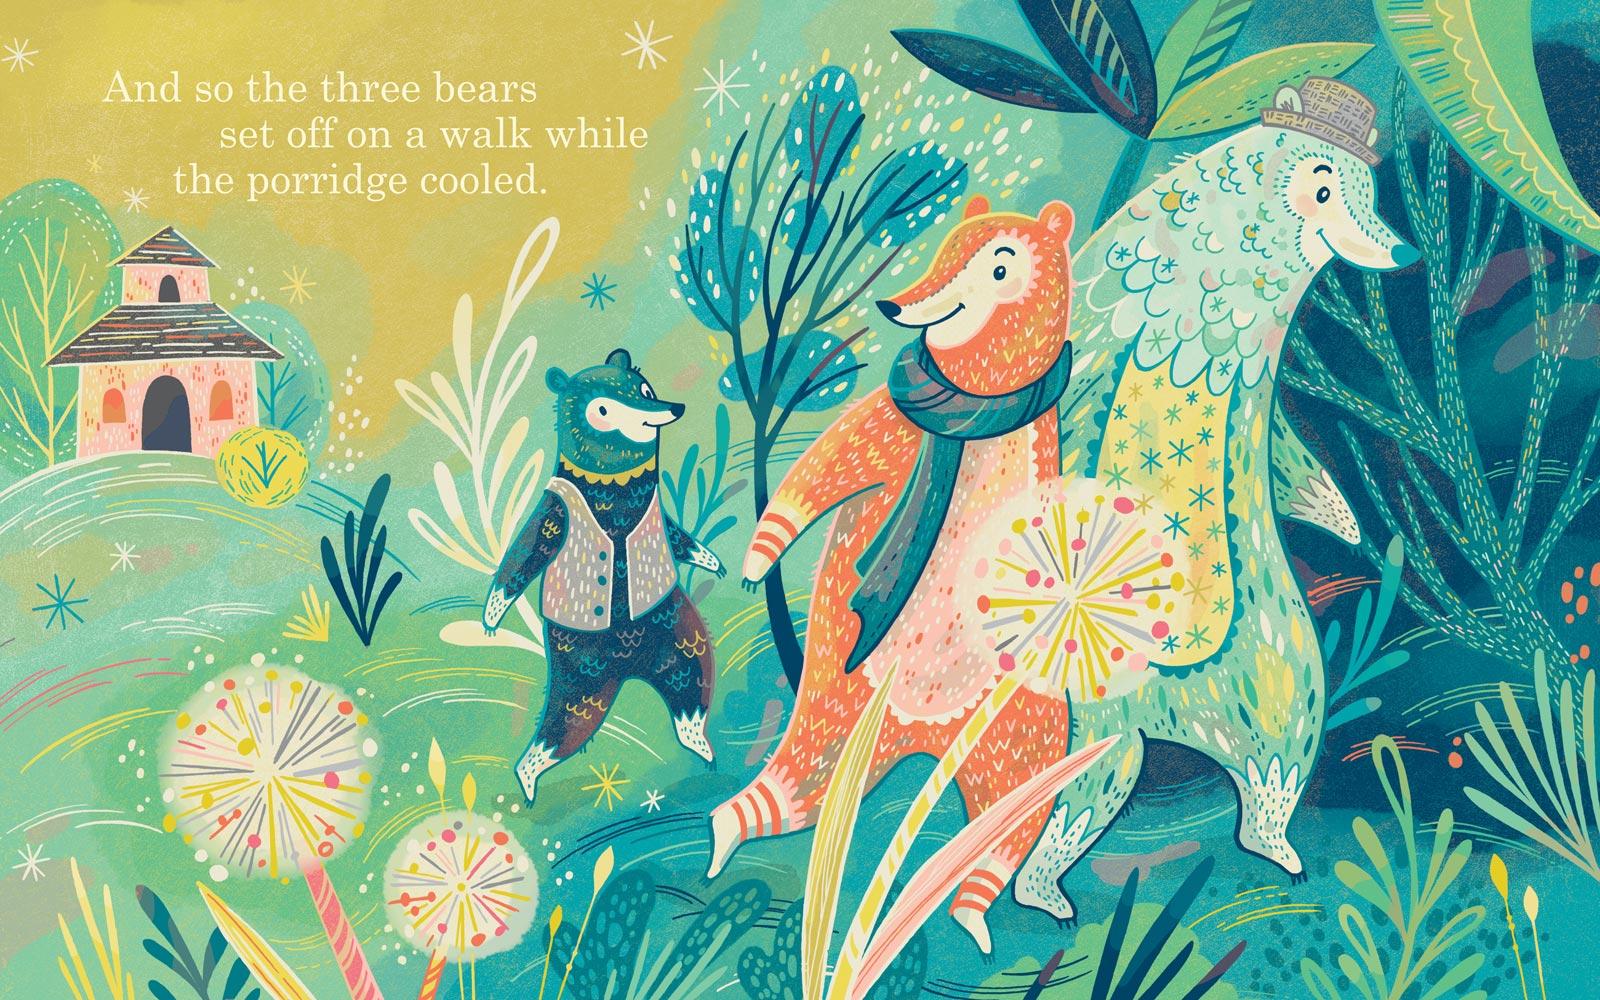 Anni_Betts_Illustration_Three_Bears